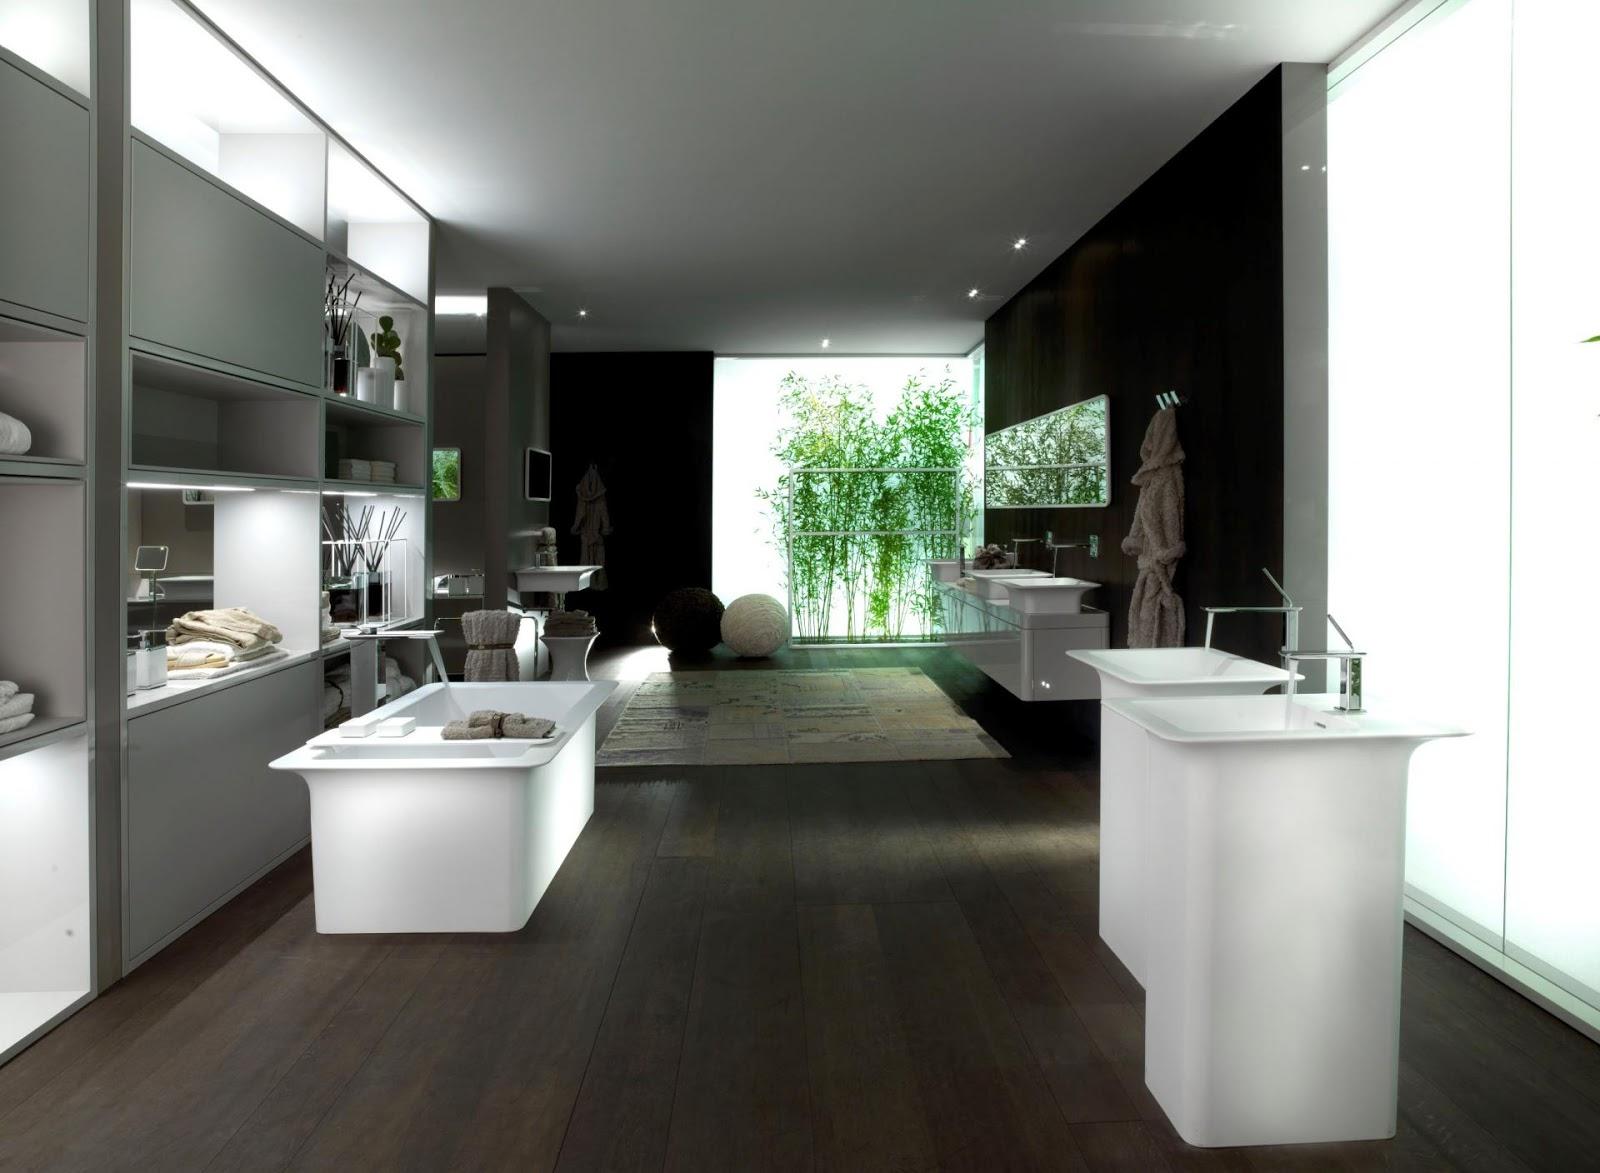 iSpa bathtub is my favourite from Gessi | Bathroom Designs